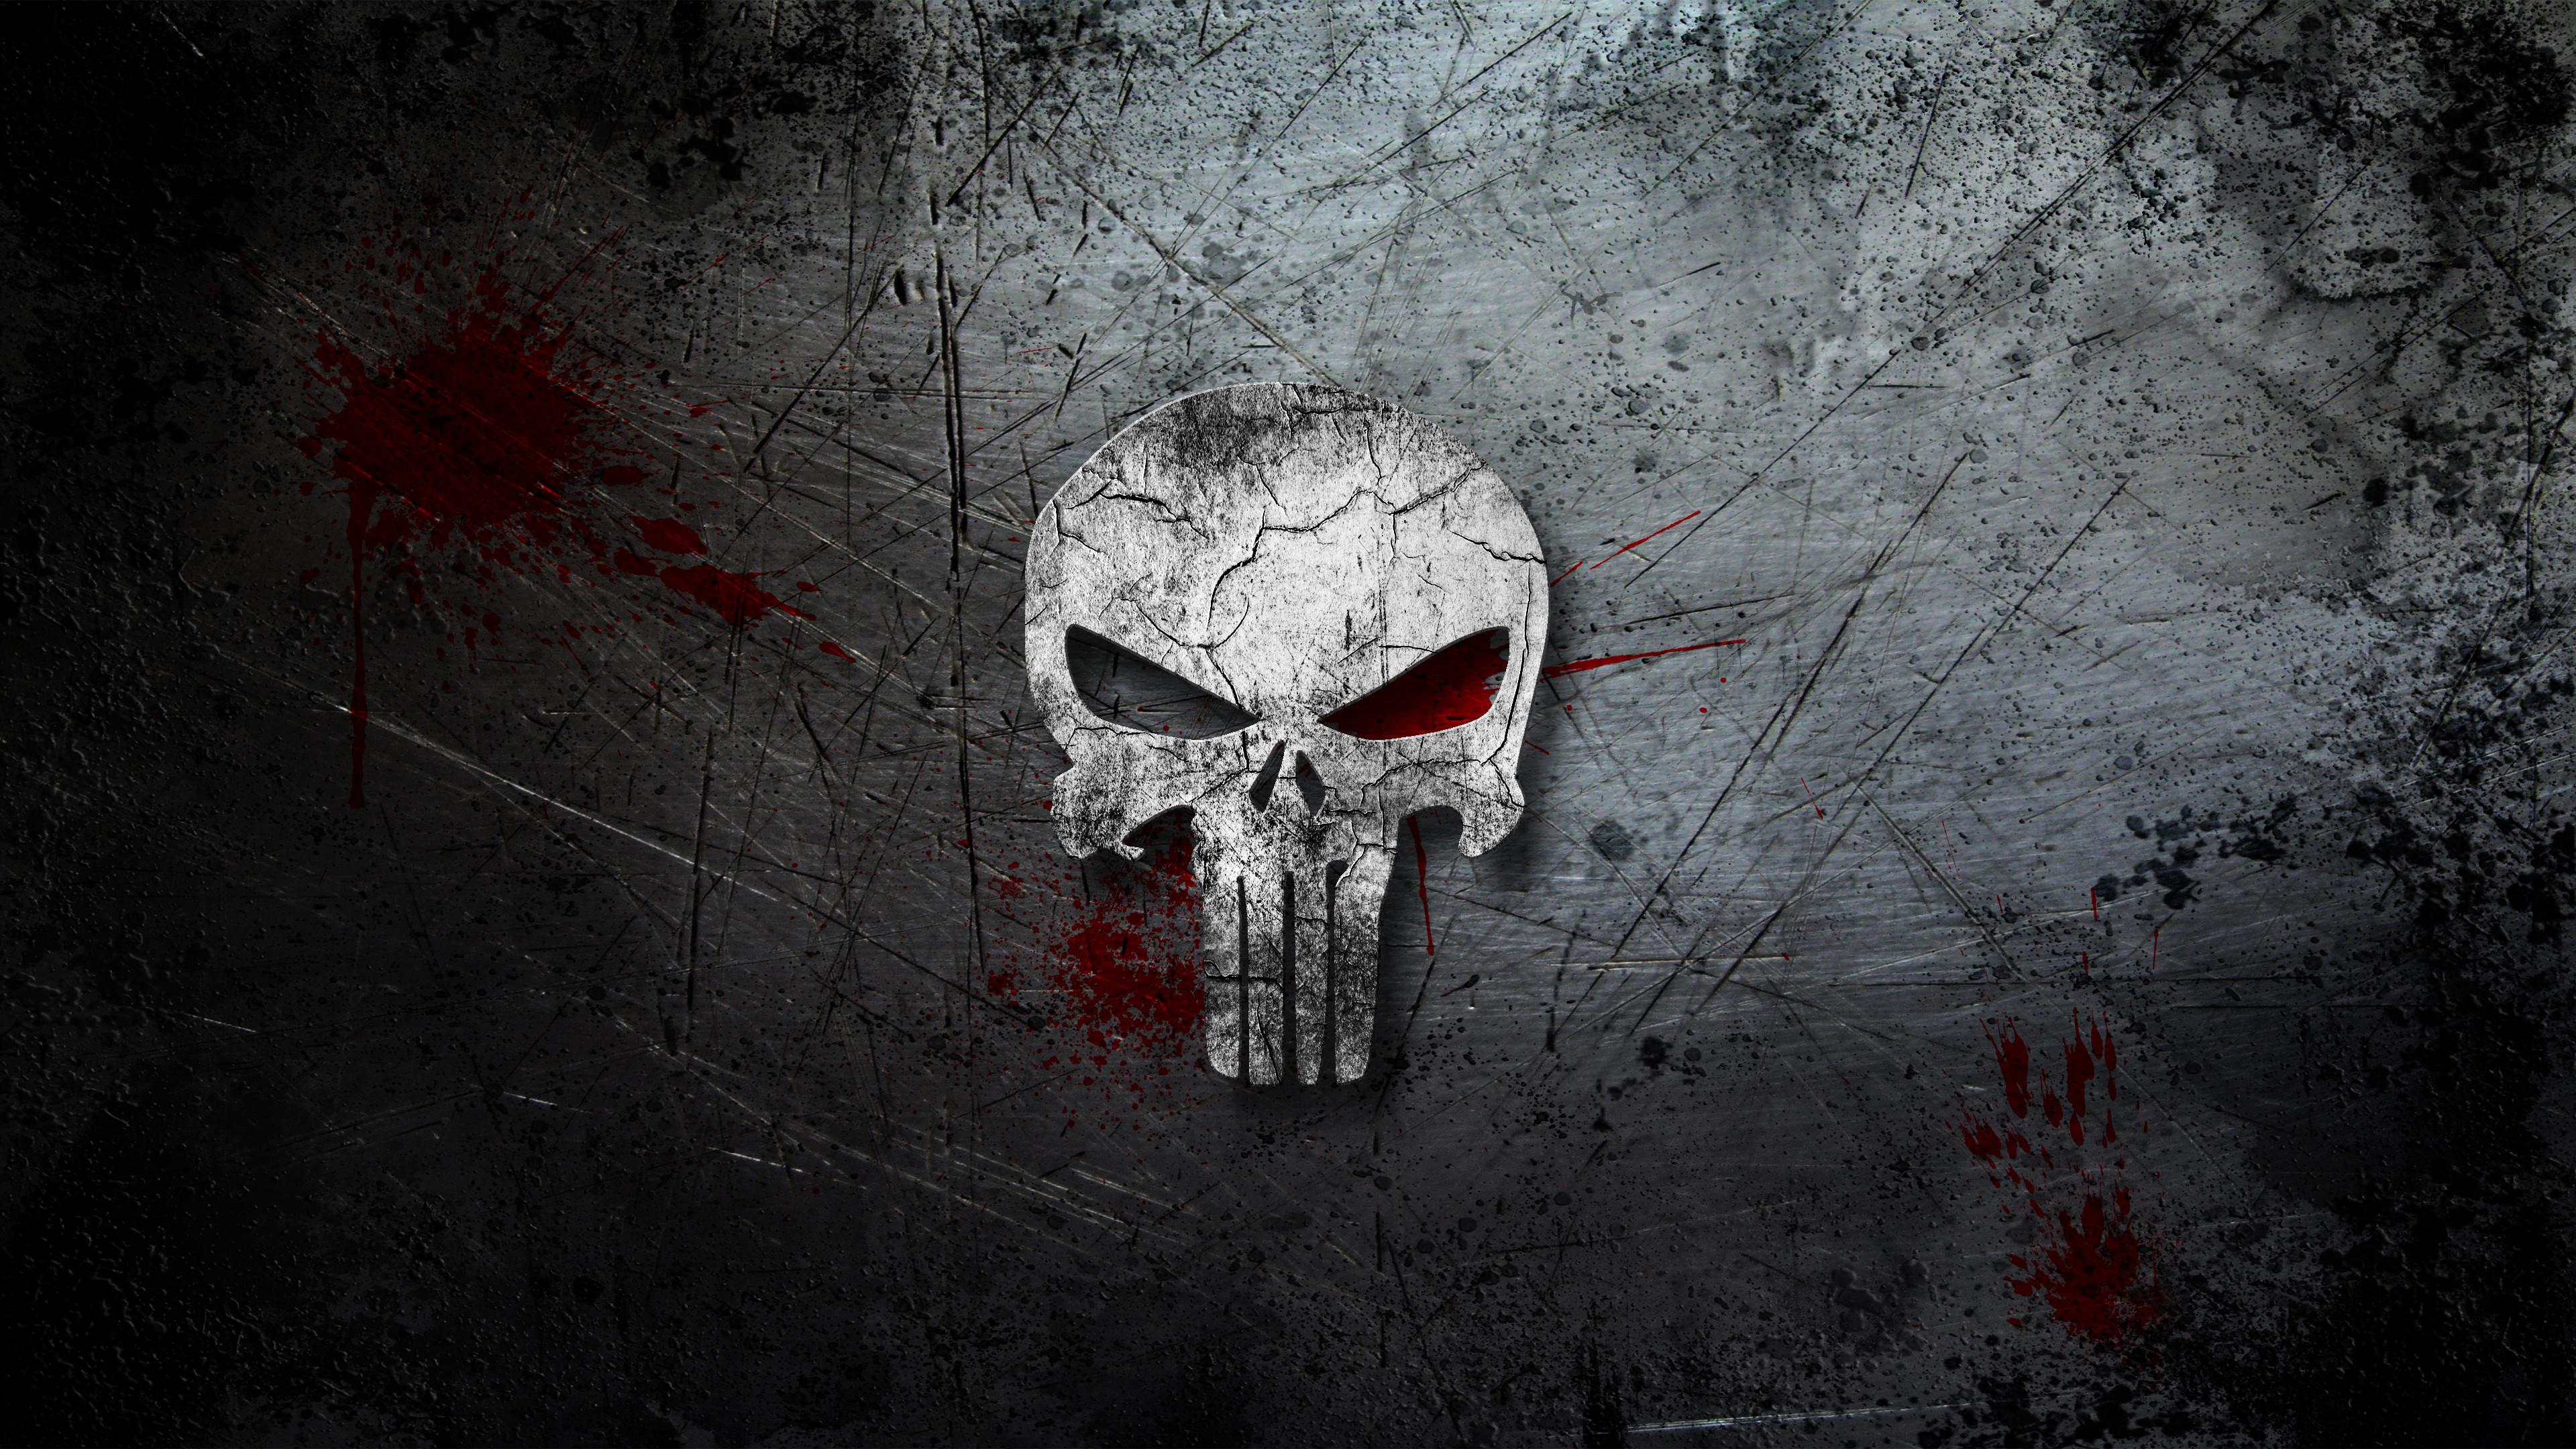 The Punisher Computer Wallpapers Desktop Backgrounds 3840x2160